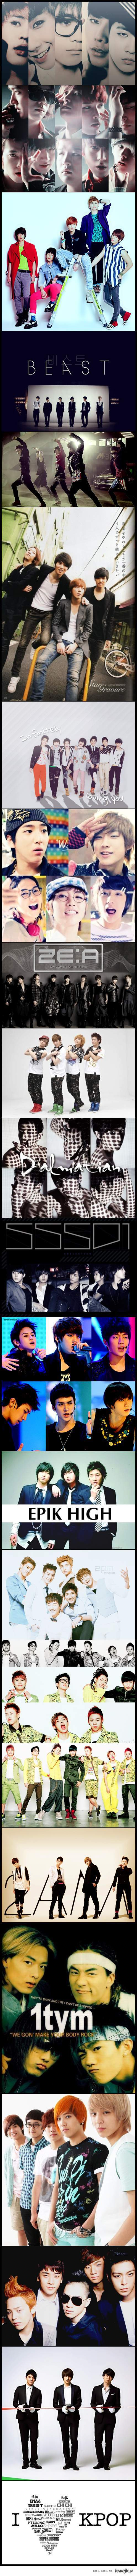 K-pop boys group